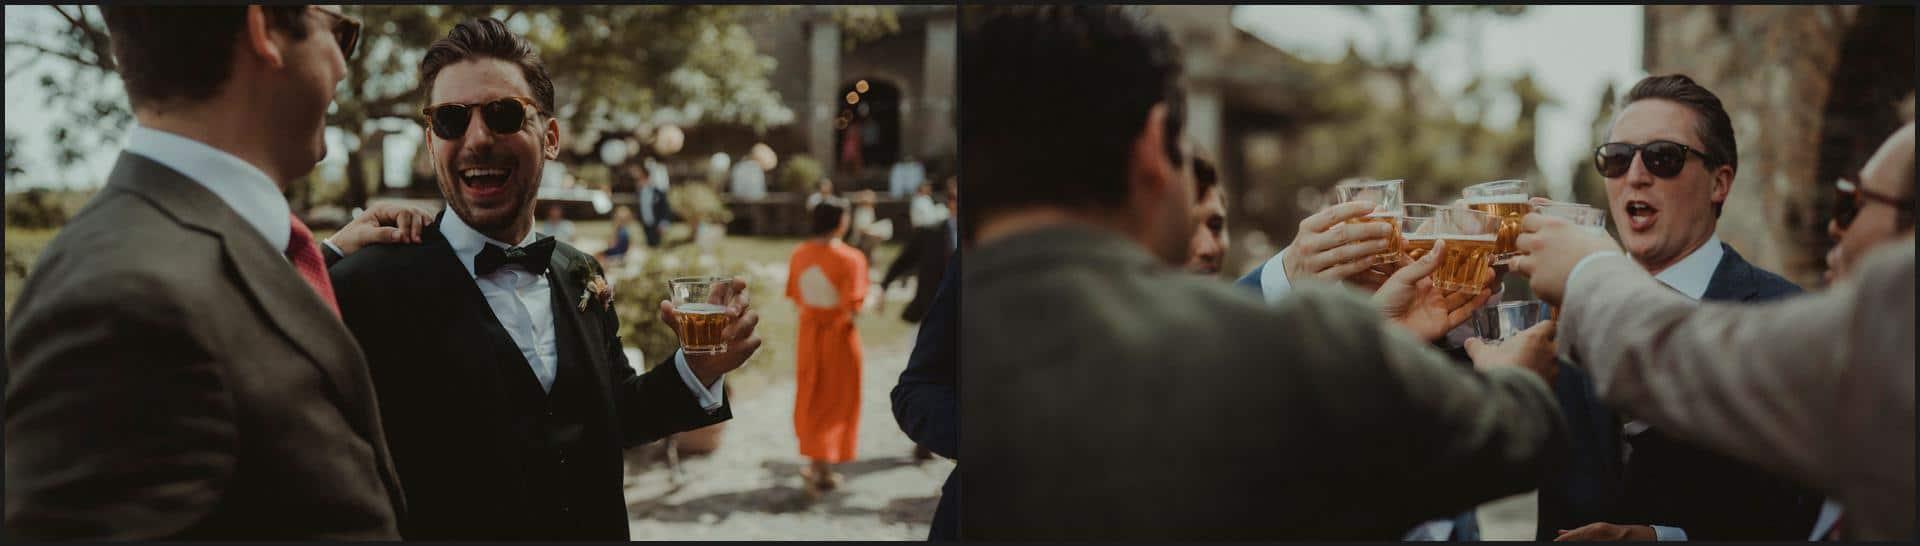 borgo di tragliata, wedding, rome, wedding in rome, wedding toast